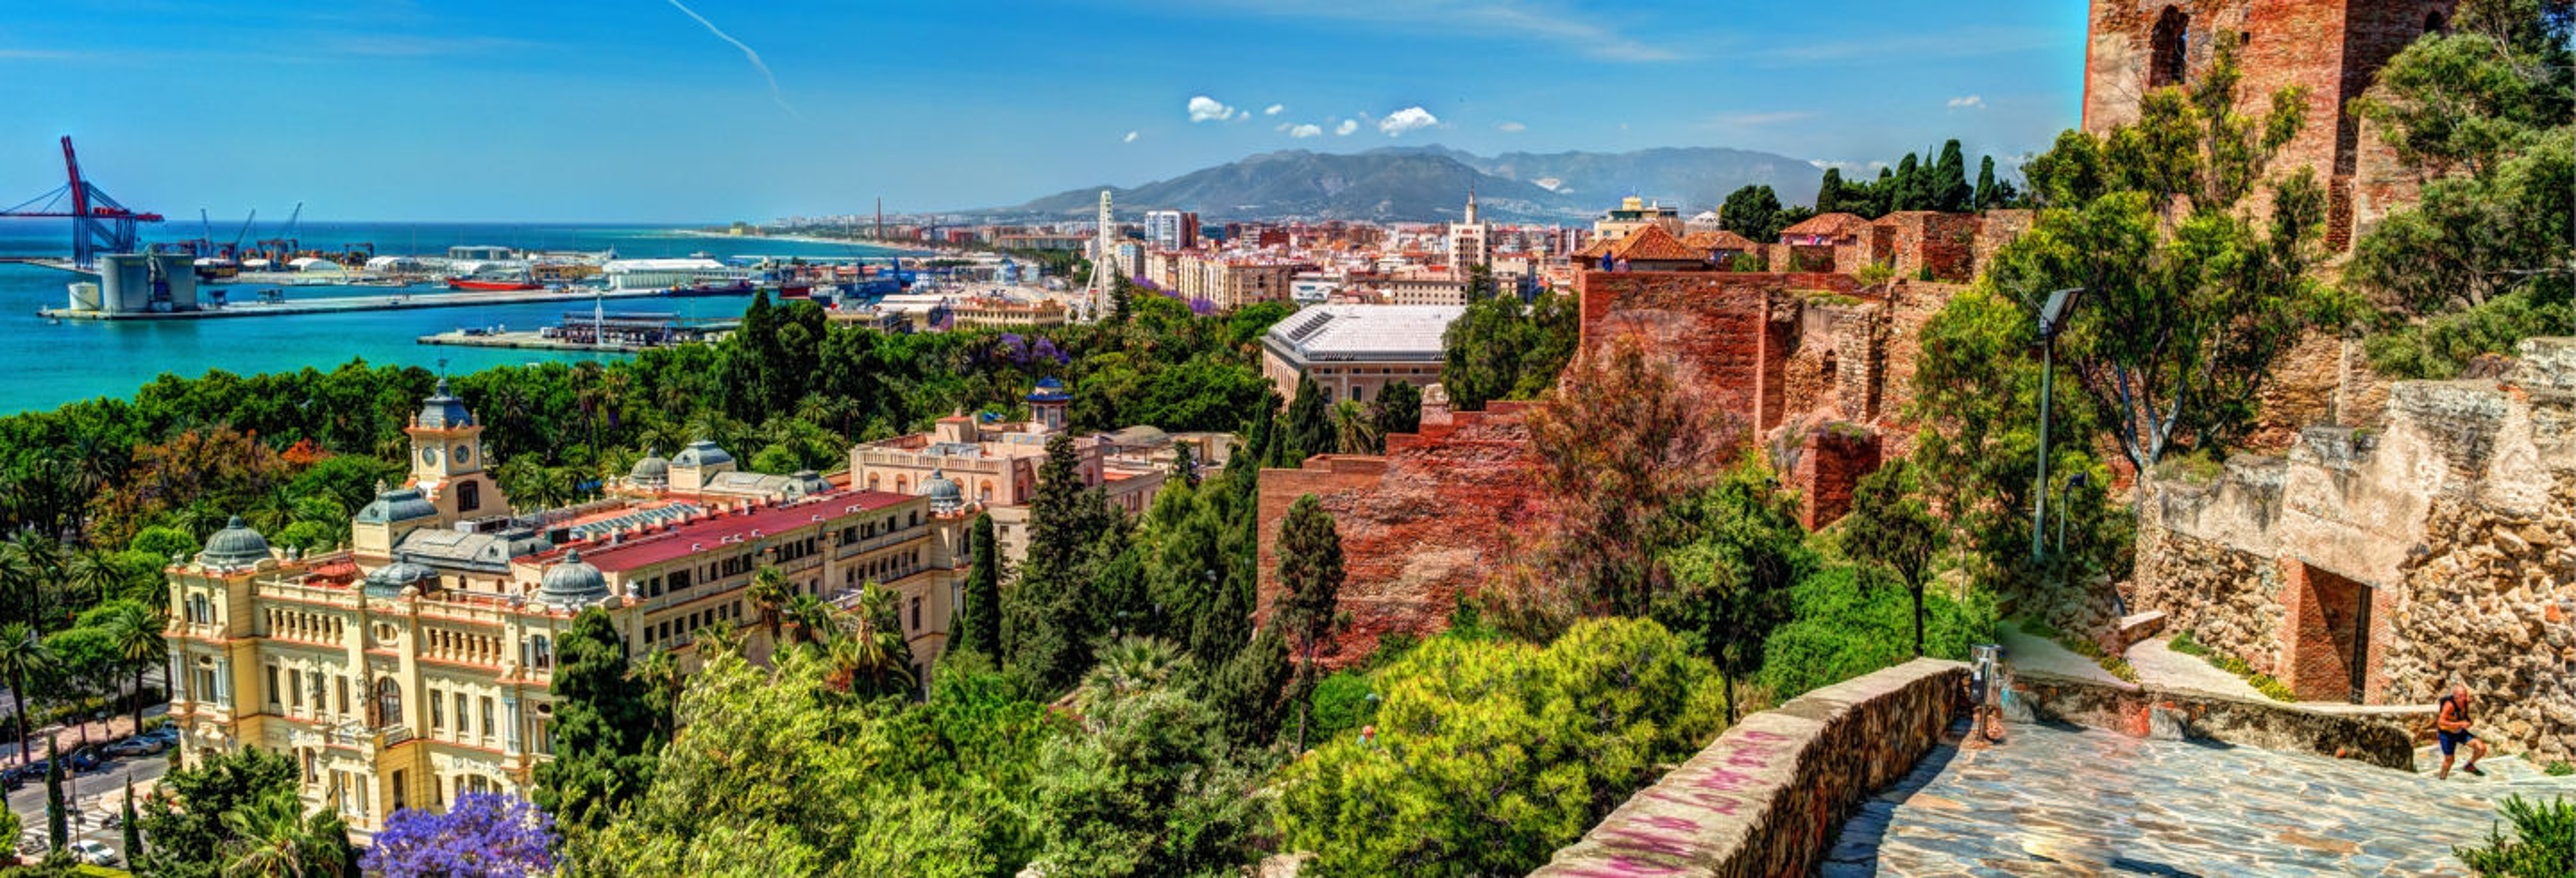 Free tour por los miradores de Málaga ¡Gratis!